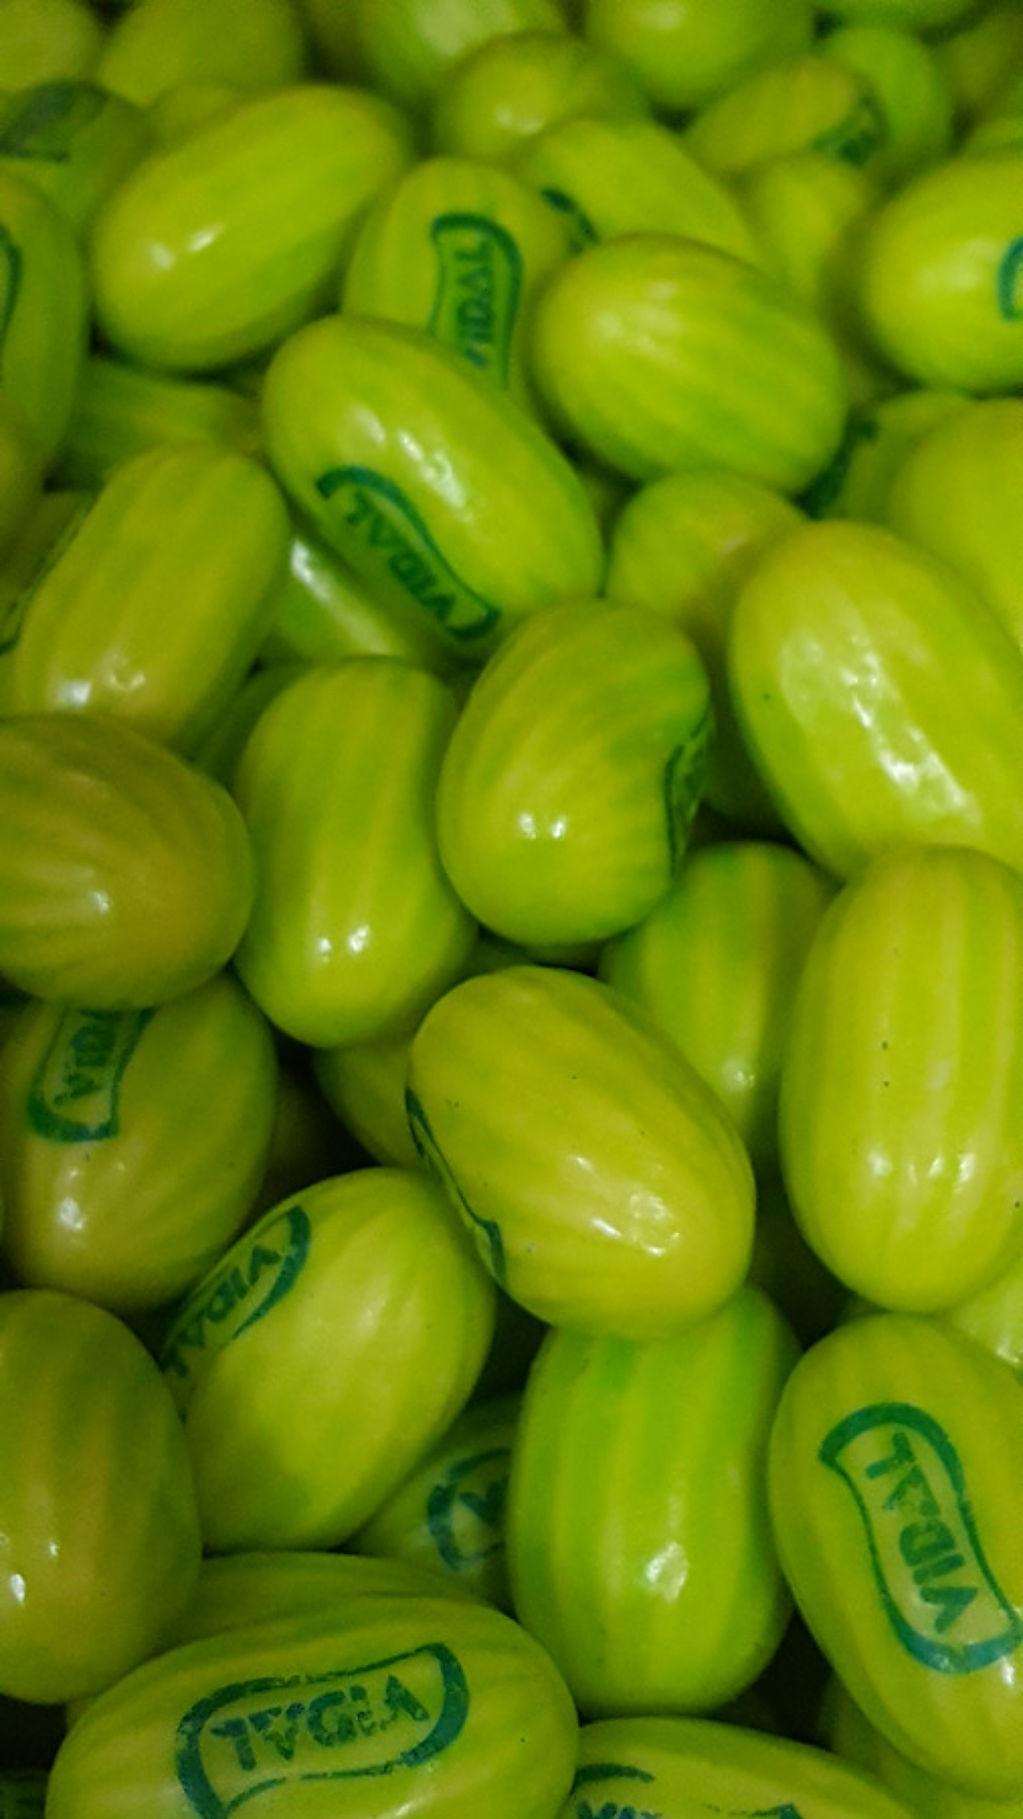 Melones vidal - db8a4-melons.jpg